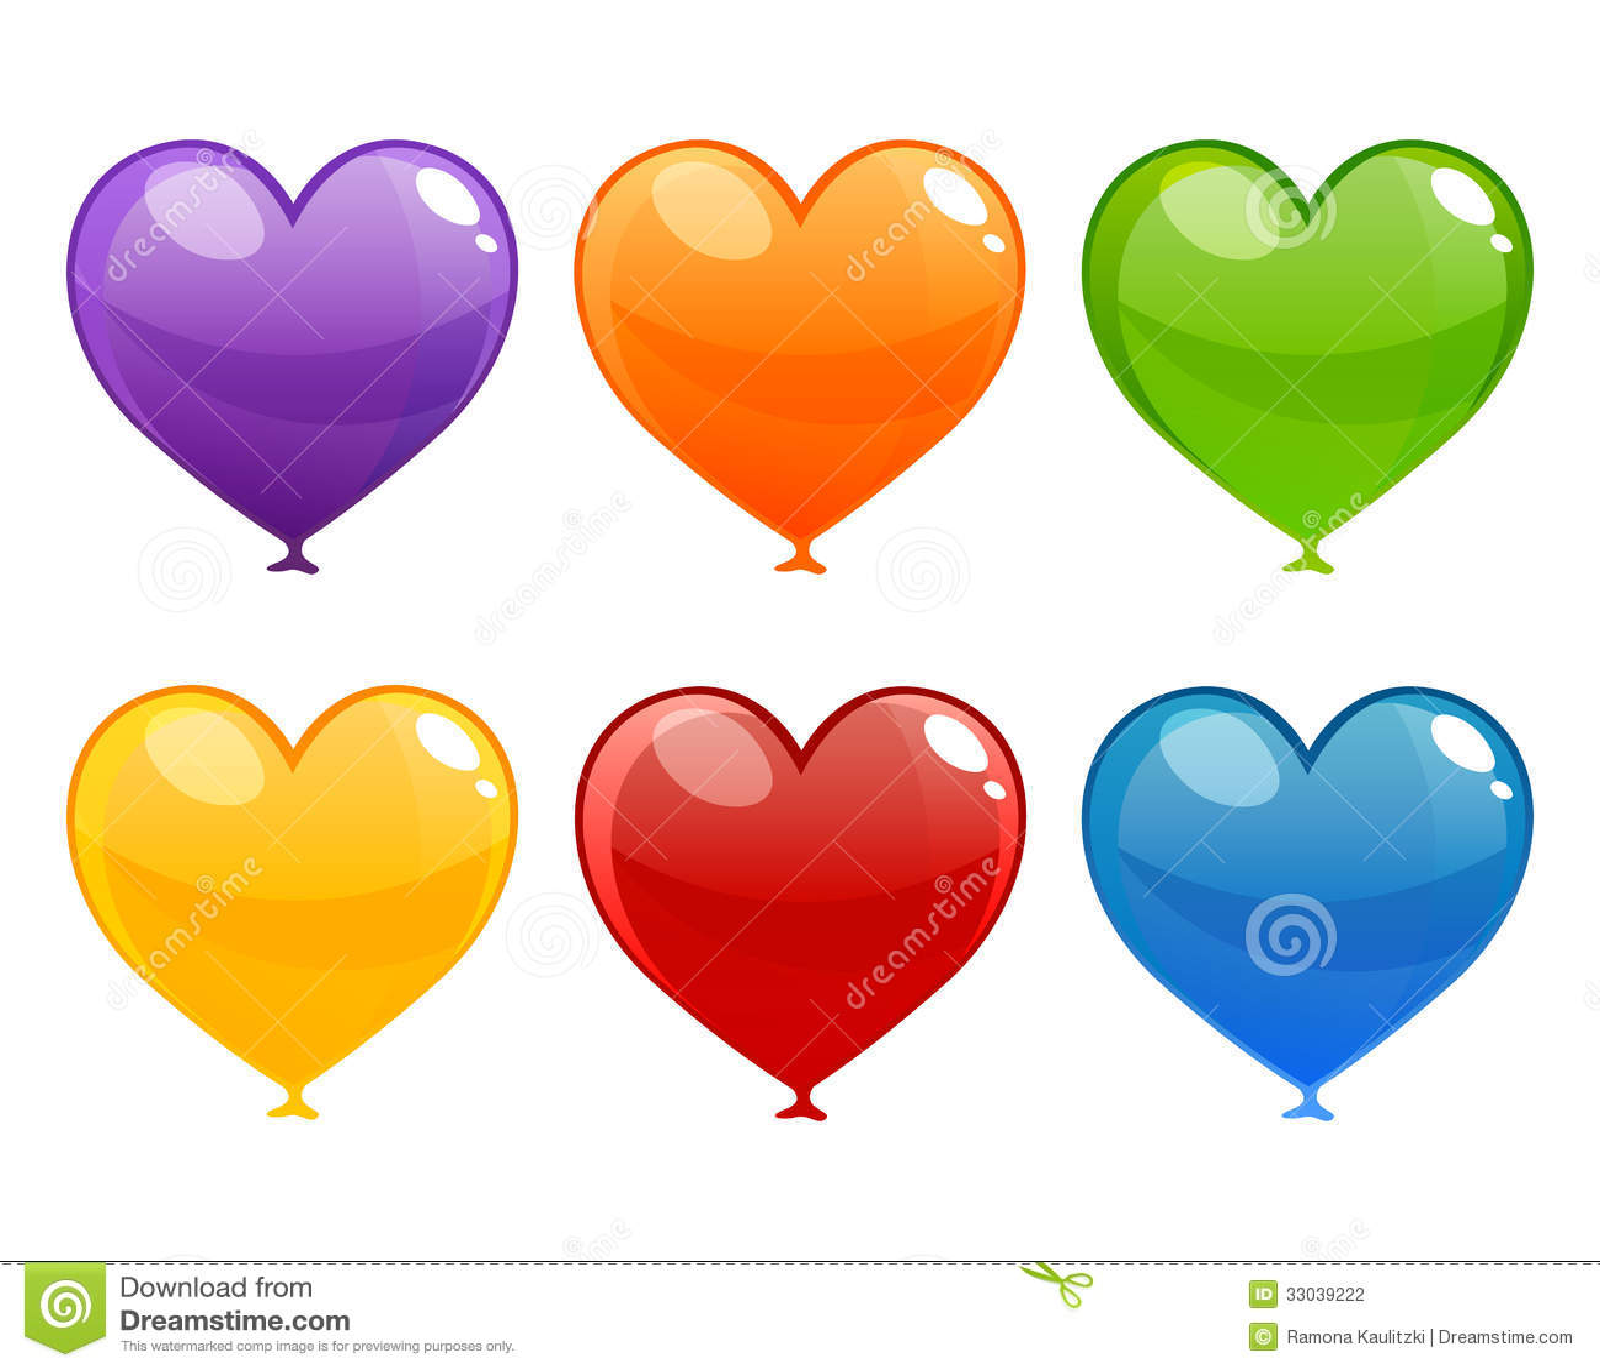 Objects Shaped Hearts